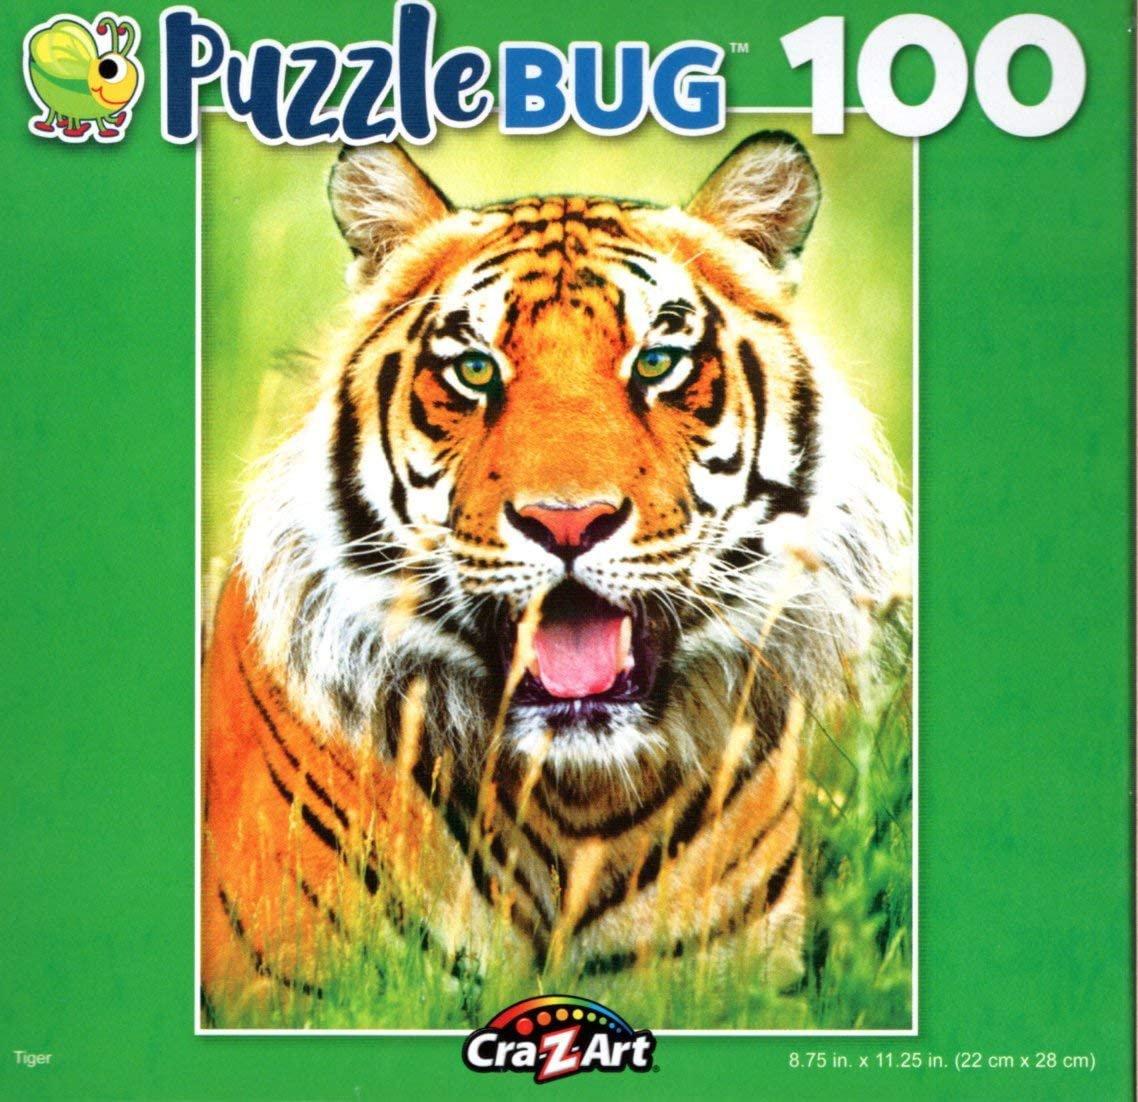 Tiger - Puzzlebug - 100 Piece Jigsaw Puzzle